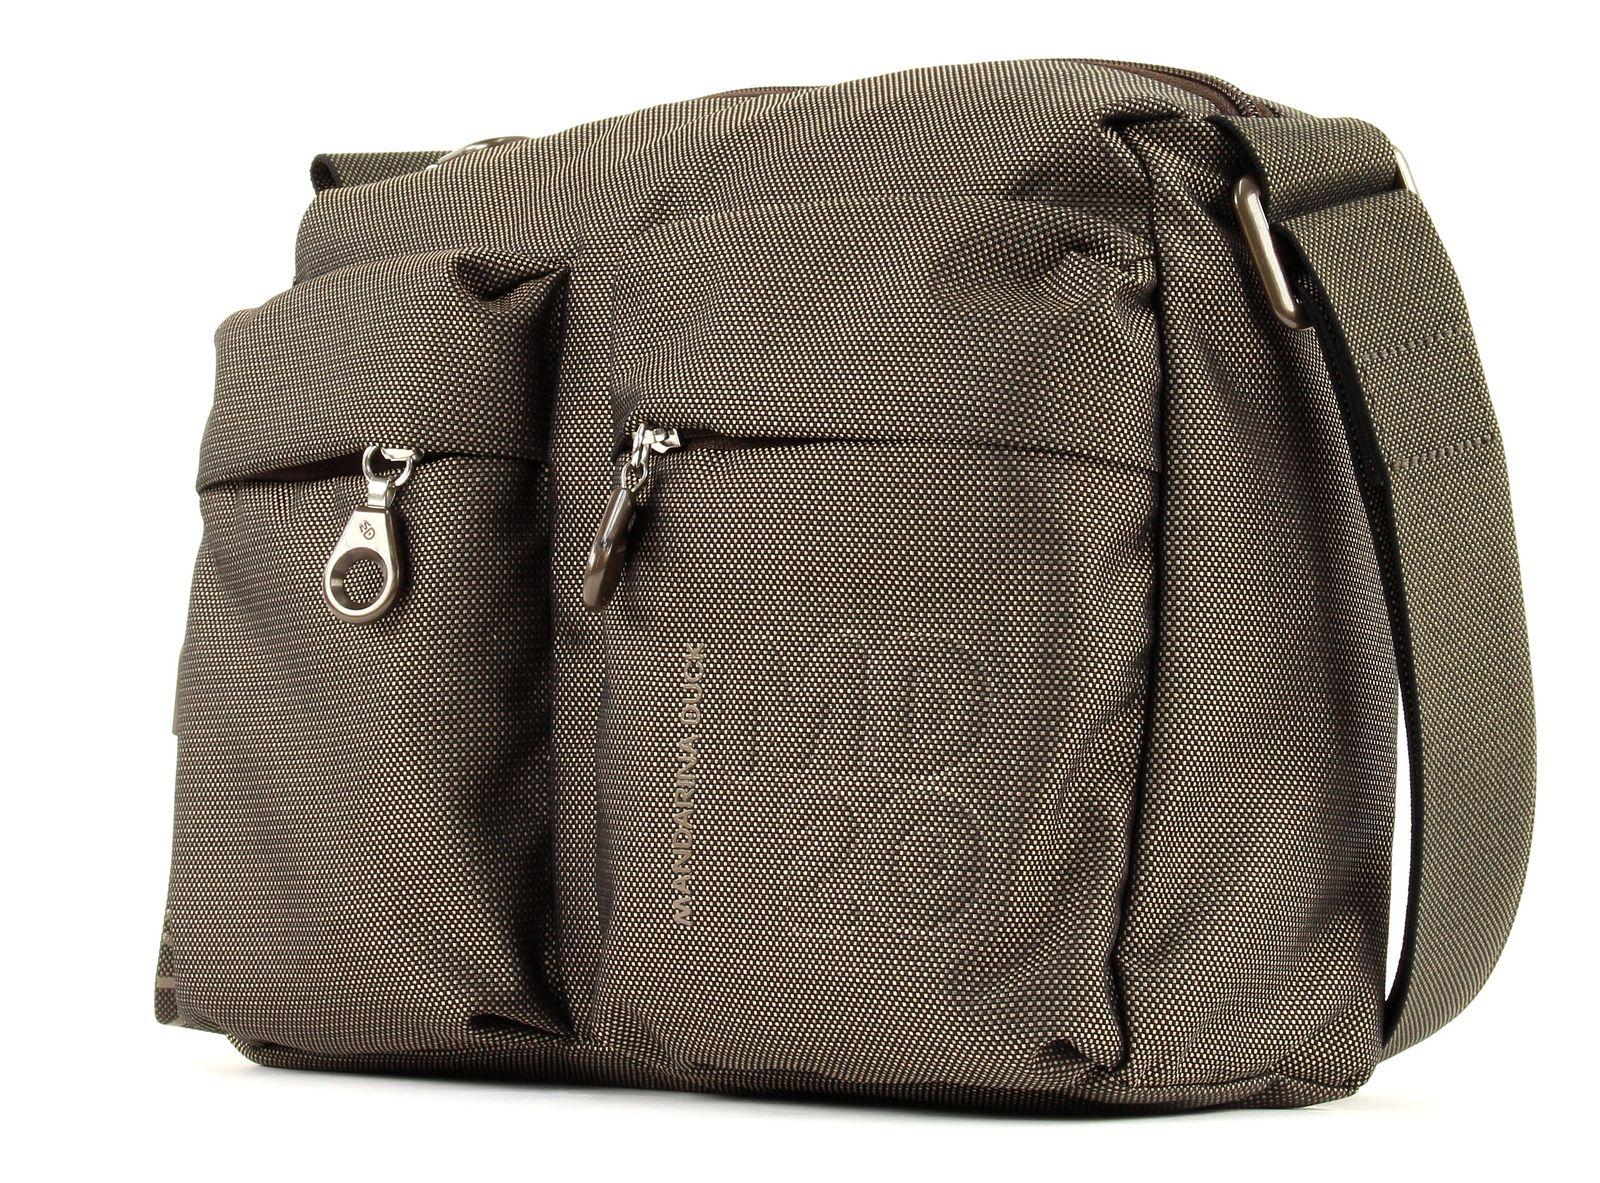 4932dea66 MANDARINA DUCK MD20 Crossover Zip M Umhängetasche Schultertasche ...